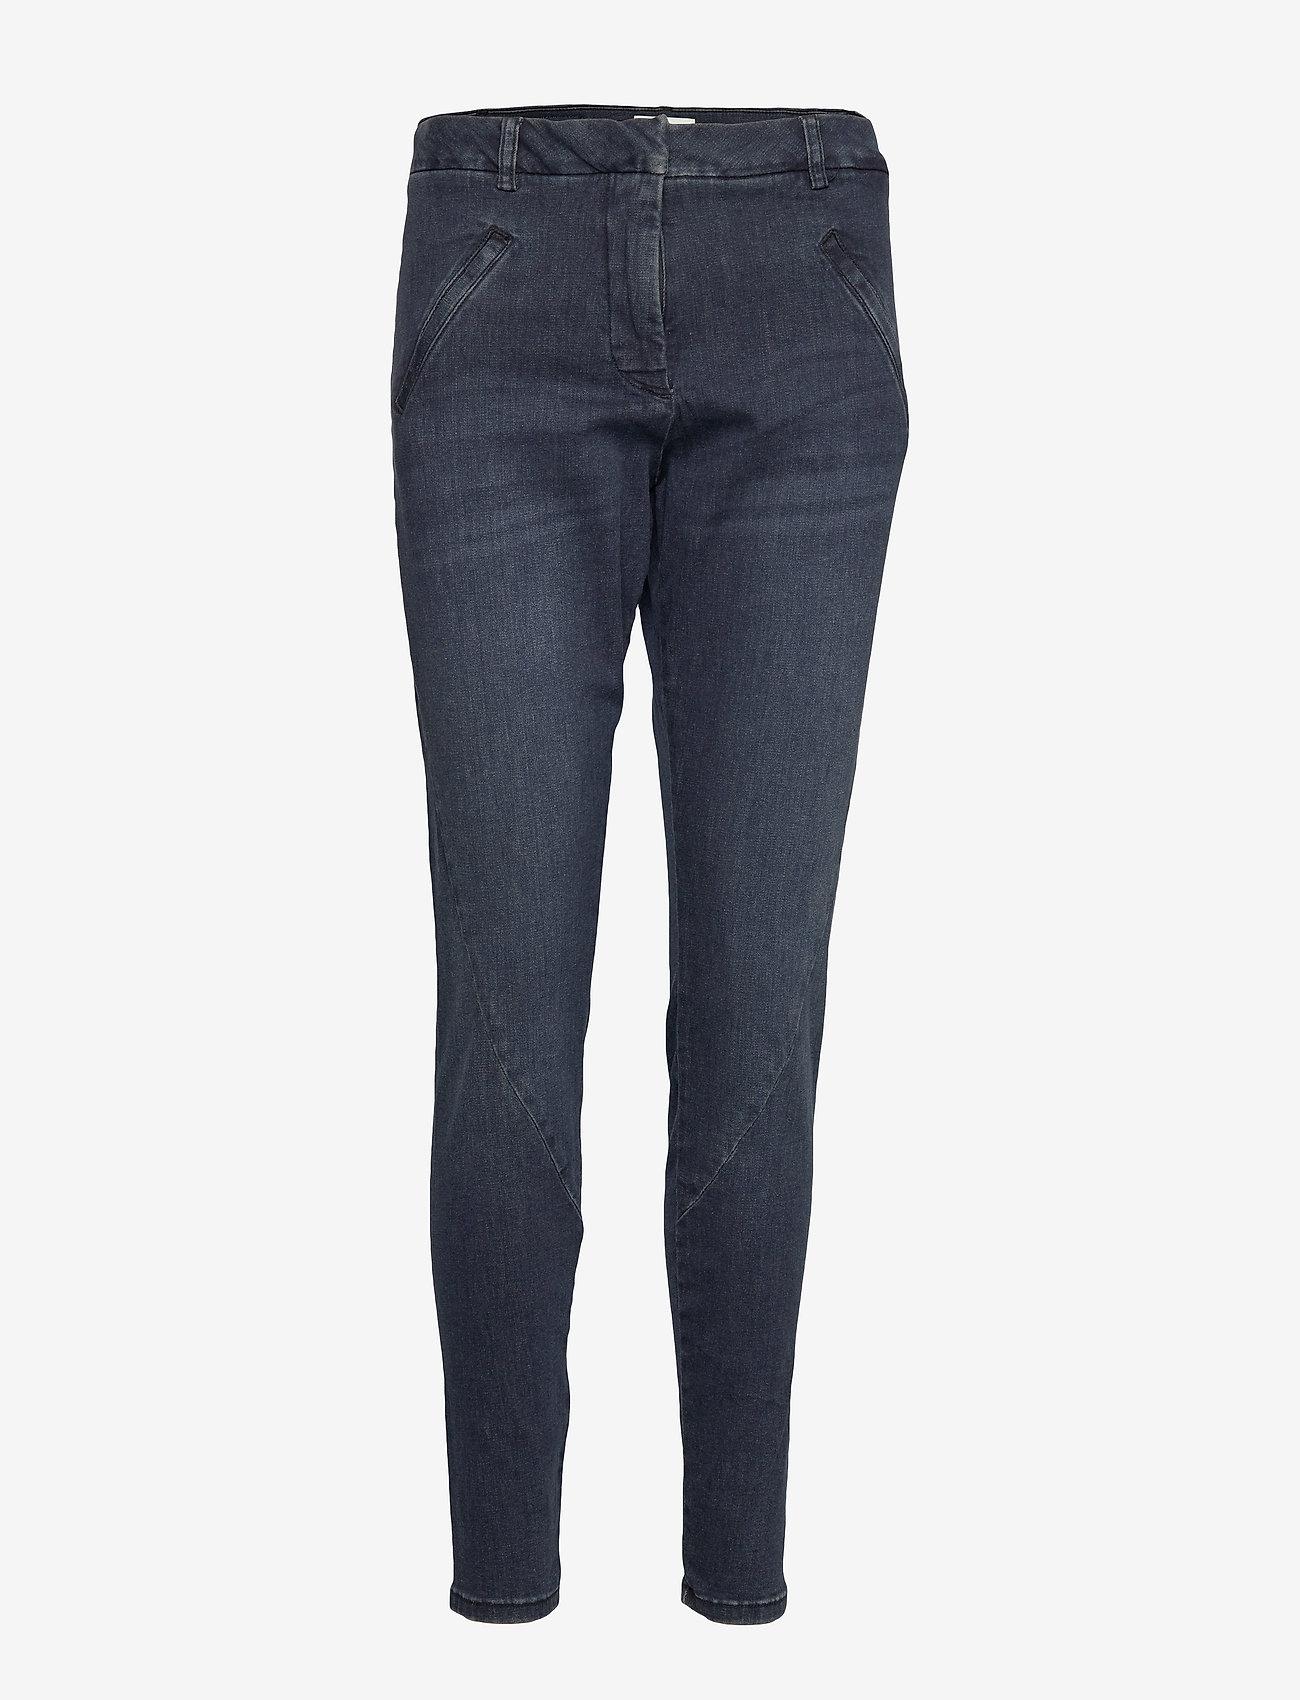 FIVEUNITS - Angelie 455 Jean - skinny jeans - neon blue raini - 0